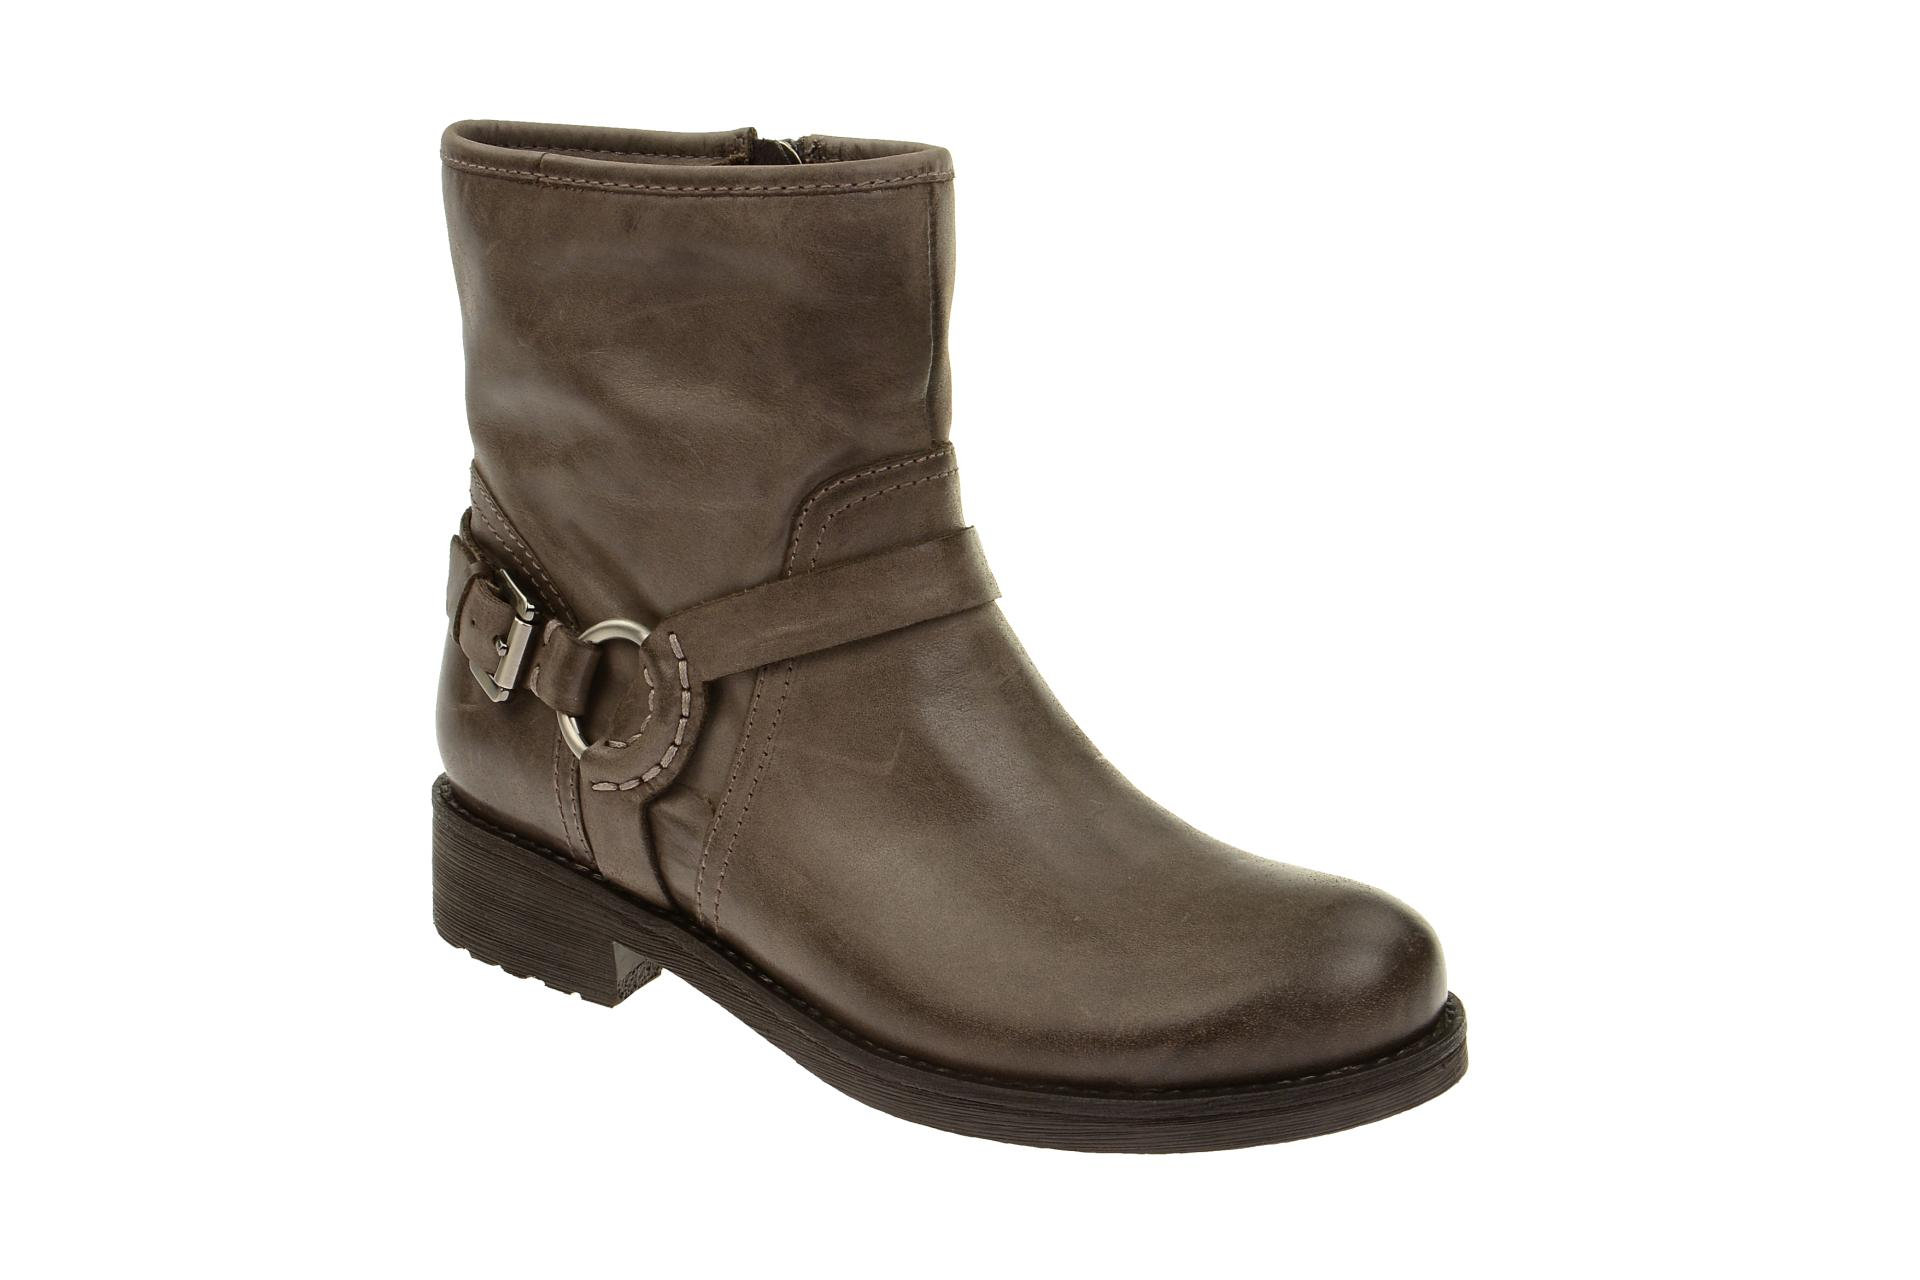 geox stiefelette new virna damen stiefel grau ankle boots. Black Bedroom Furniture Sets. Home Design Ideas